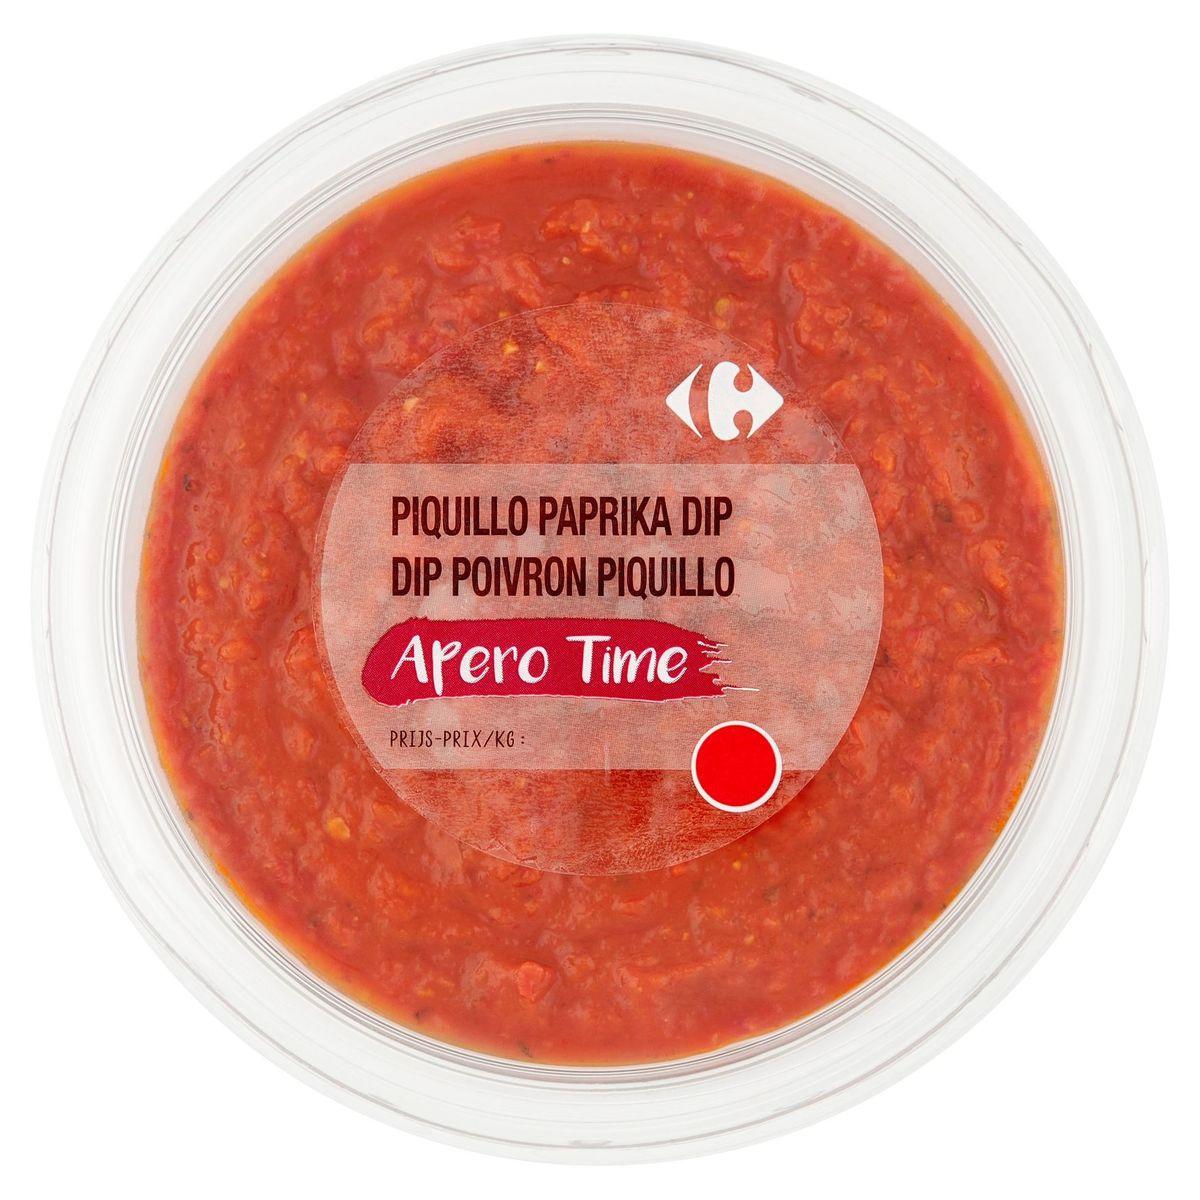 Carrefour Apero Time Dip Poivron Piquillo 175 g